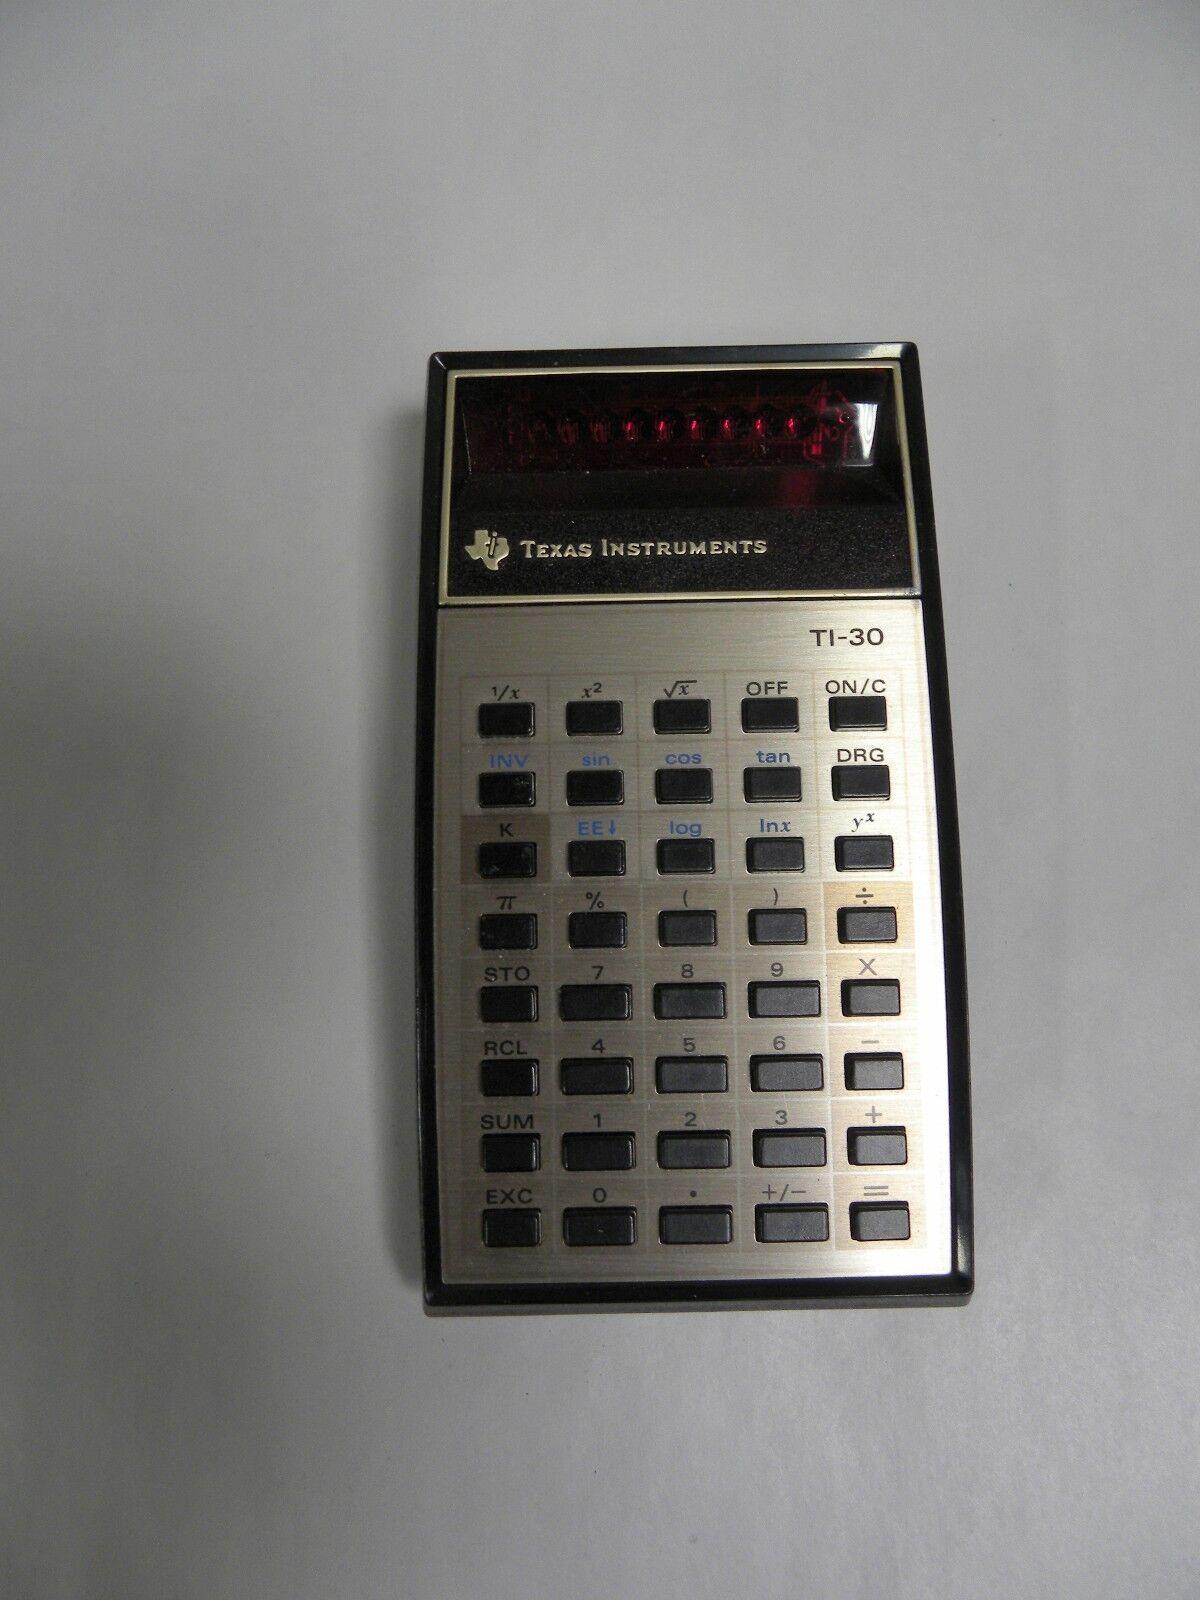 Vintage Texas Instruments Ti-30 Electronic Calculator (A5)